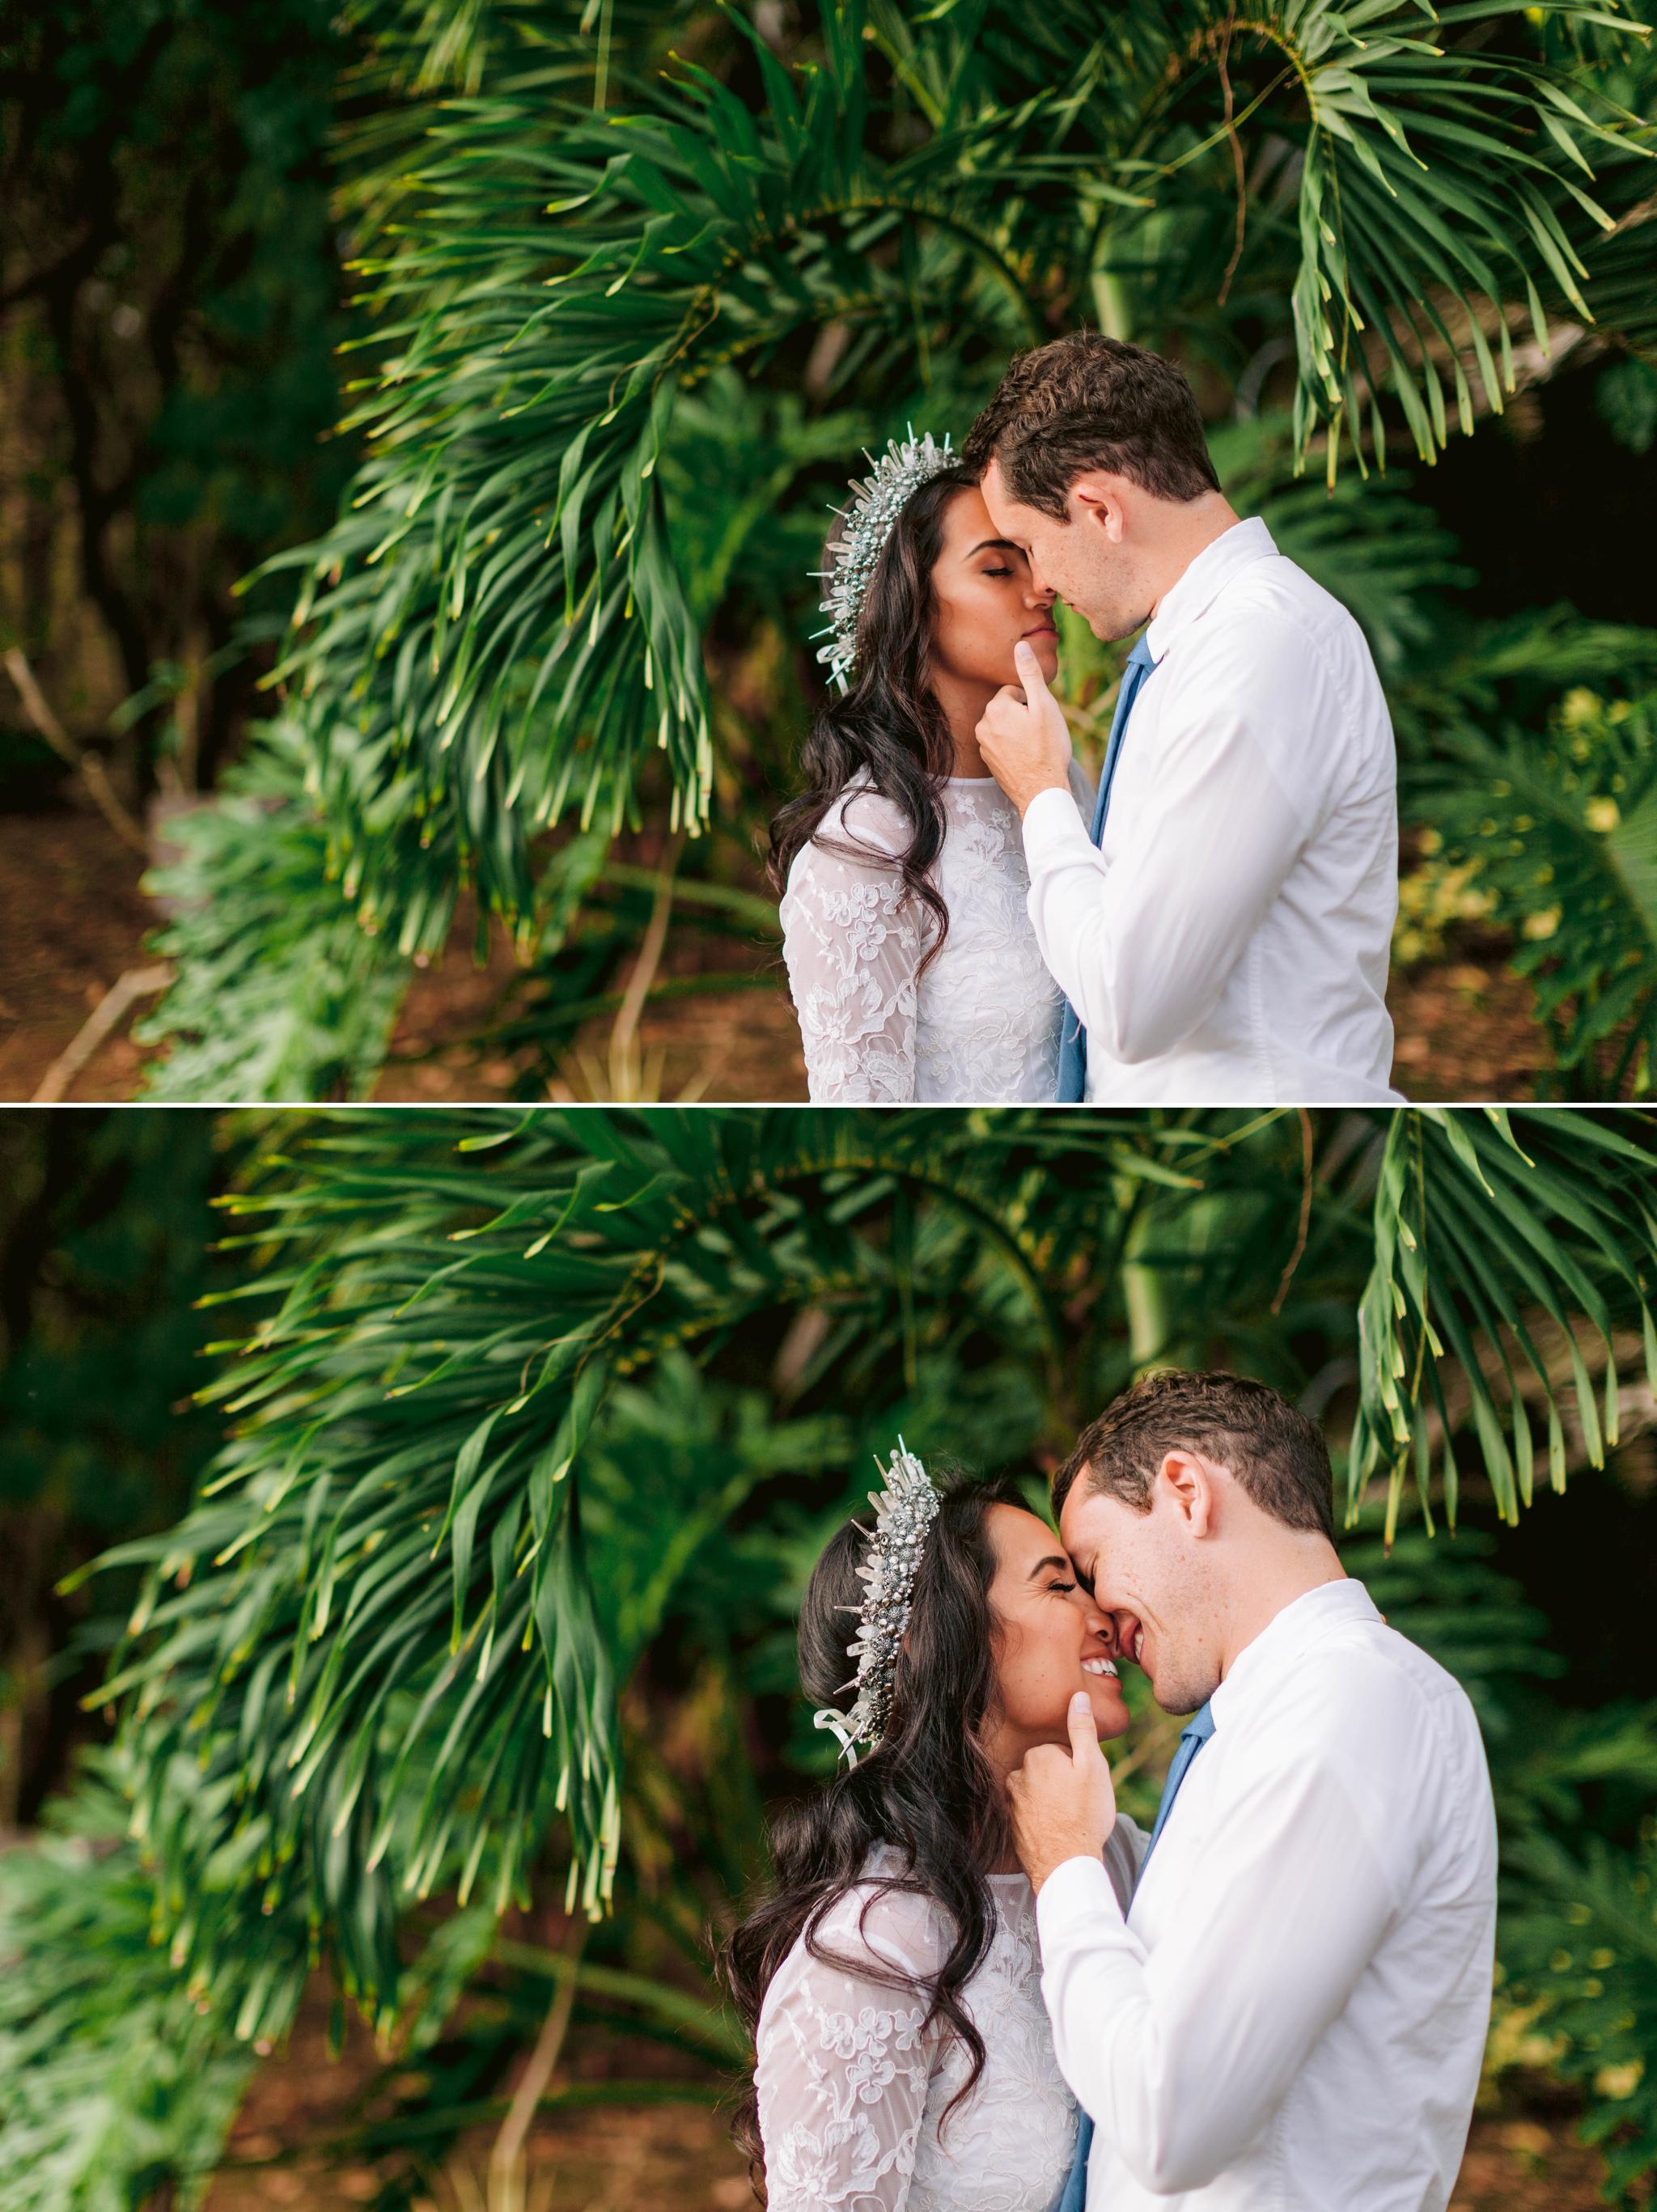 Bride and Groom kissing under palm trees -wedding dress by asos and a unique crown Ana + Elijah - Wedding at Loulu Palm in Haleiwa, HI - Oahu Hawaii Wedding Photographer - #hawaiiweddingphotographer #oahuweddings #hawaiiweddings